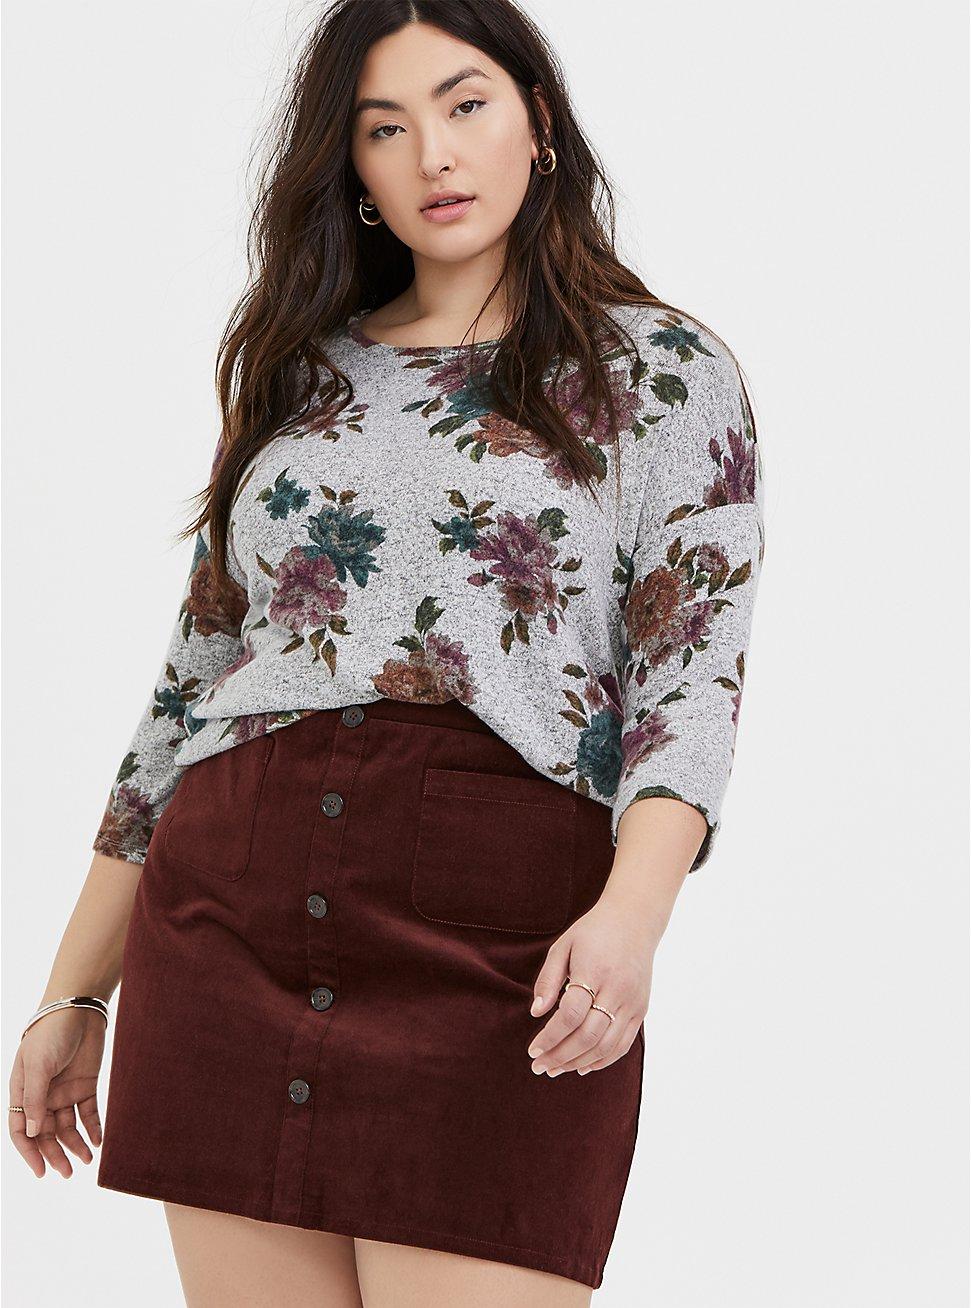 Super Soft Plush Grey Floral Top, FLORAL - GREY, hi-res